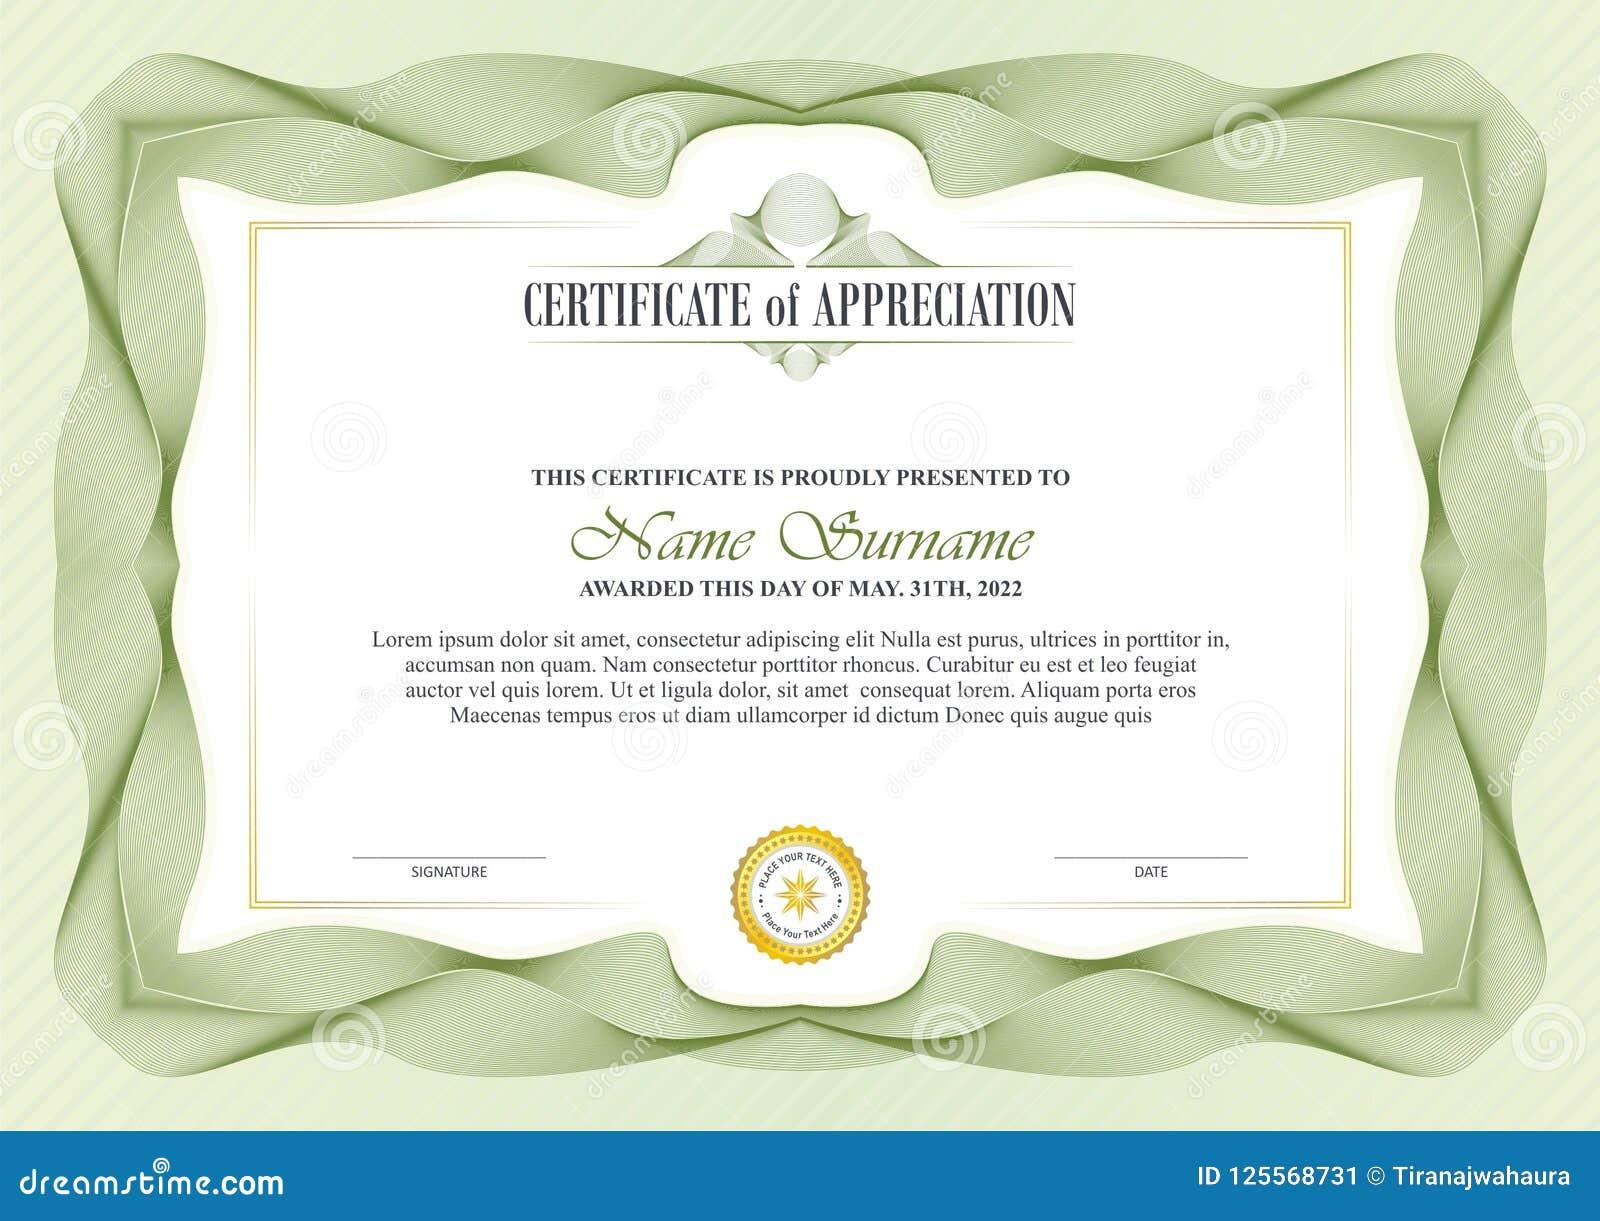 Stylish Certificate Frame with Guilloche border design